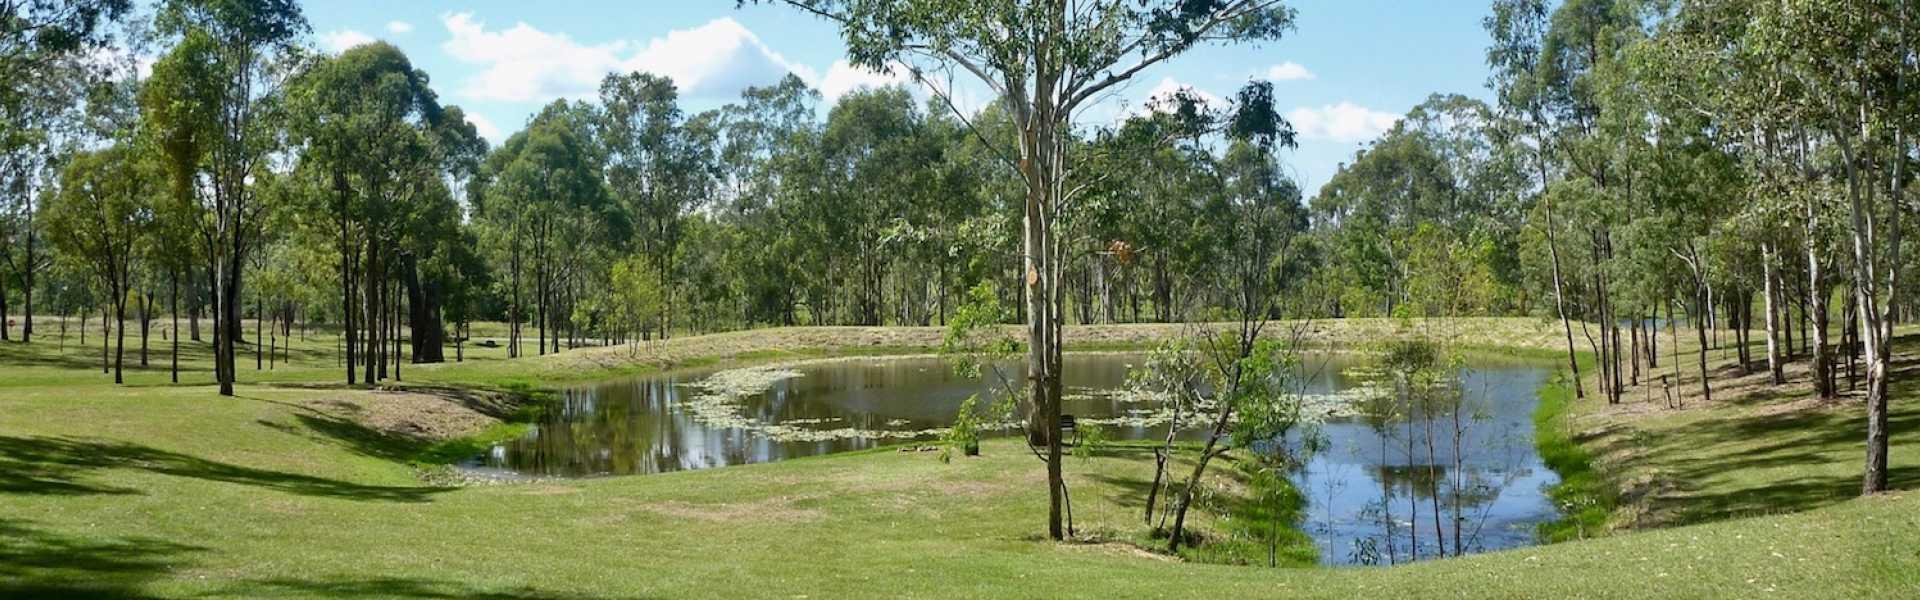 Kui Parks, Barambah Bush Caravan and Camping Park, Murgon, Dam